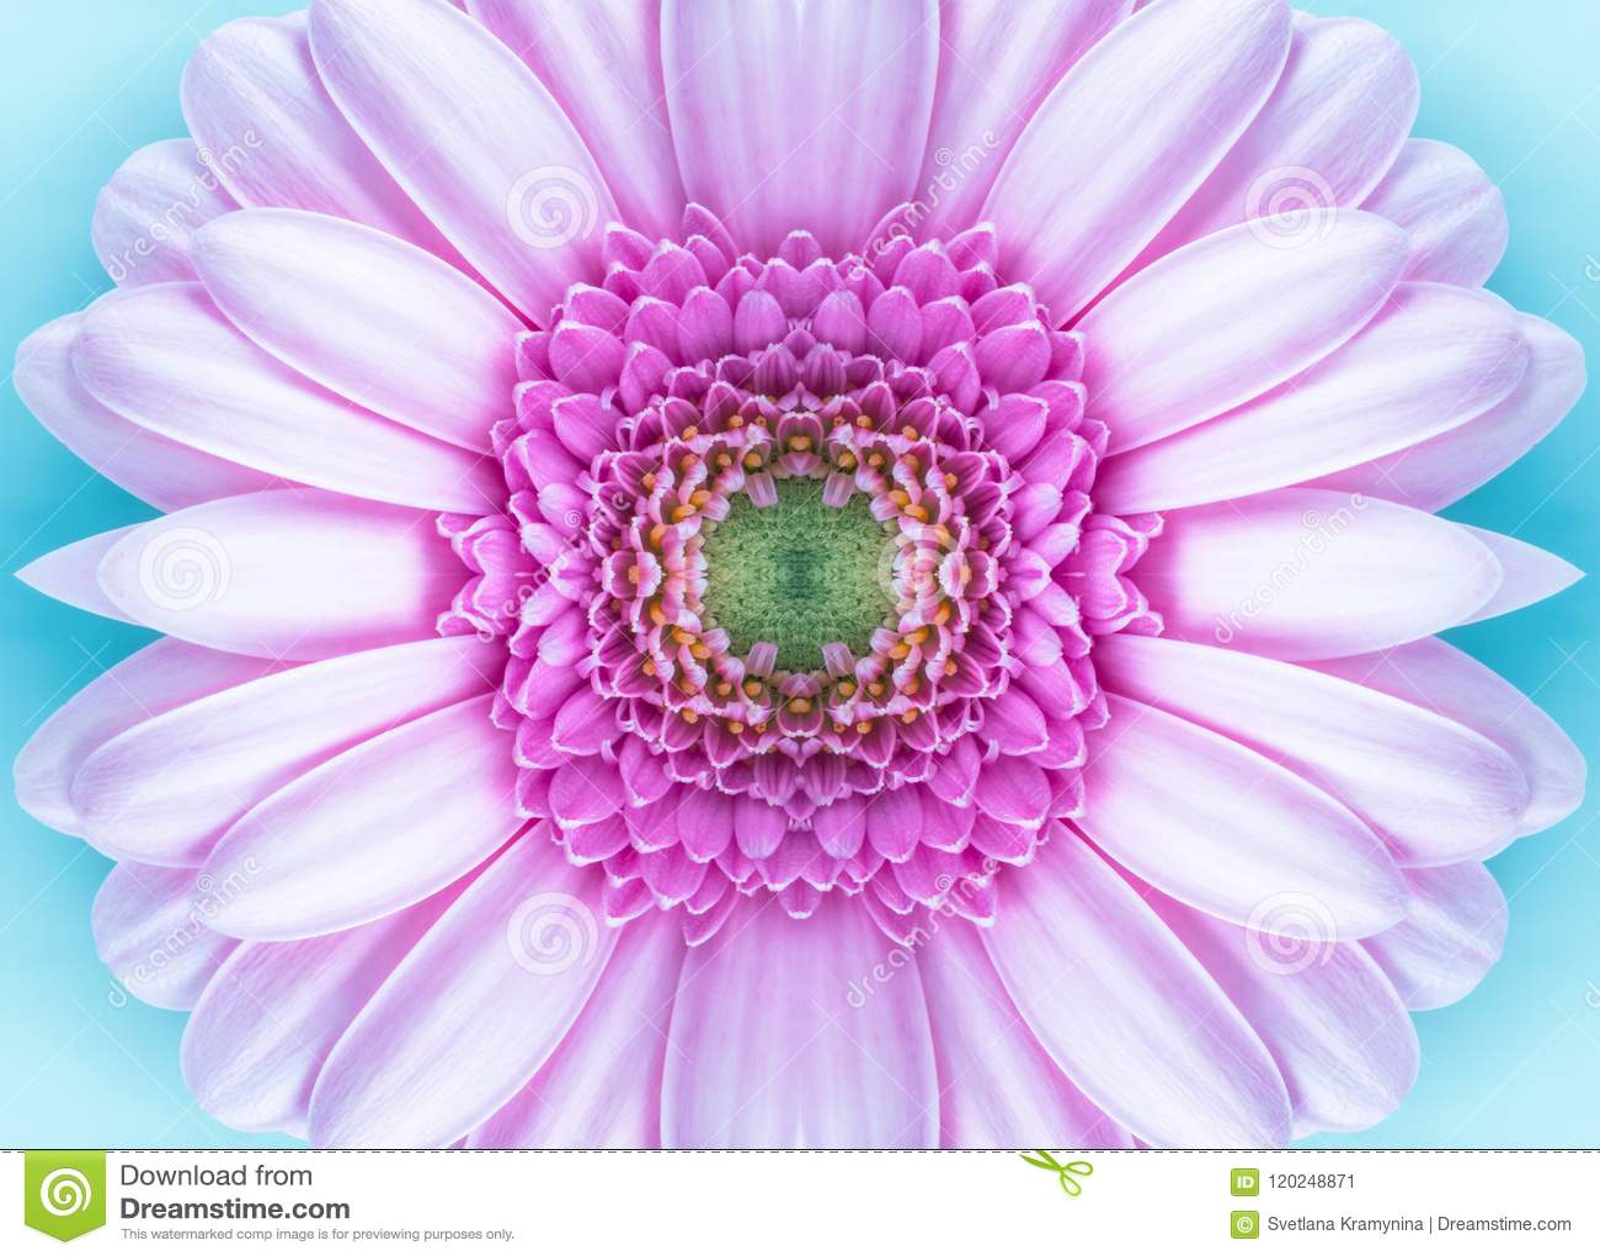 attractive wallpaper gerbera daisy flowery picturesque | www